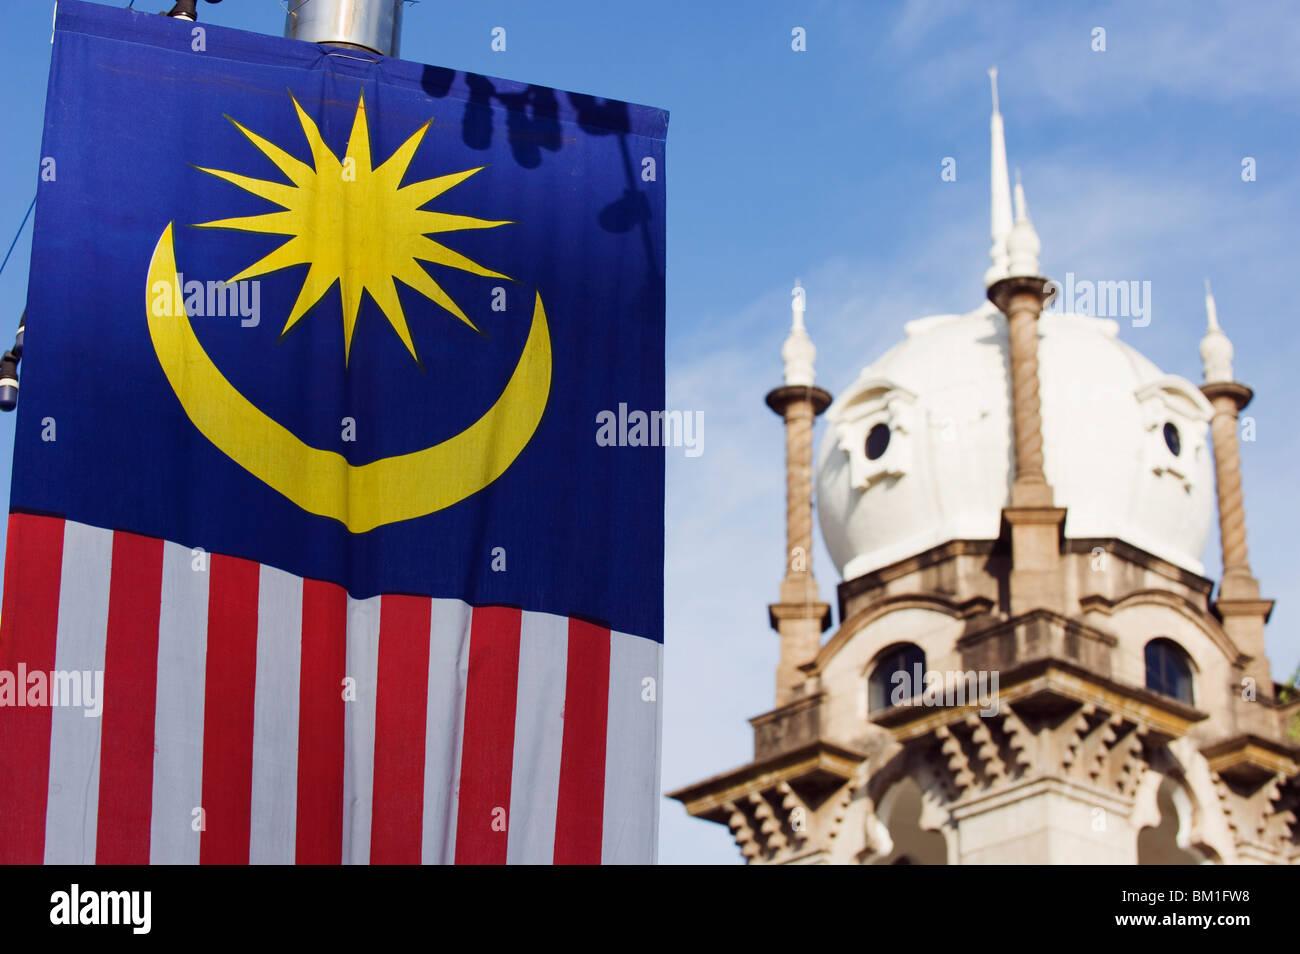 Malaysian flag and Old KL Railway Station, Kuala Lumpur, Malaysia, Southeast Asia, Asia - Stock Image